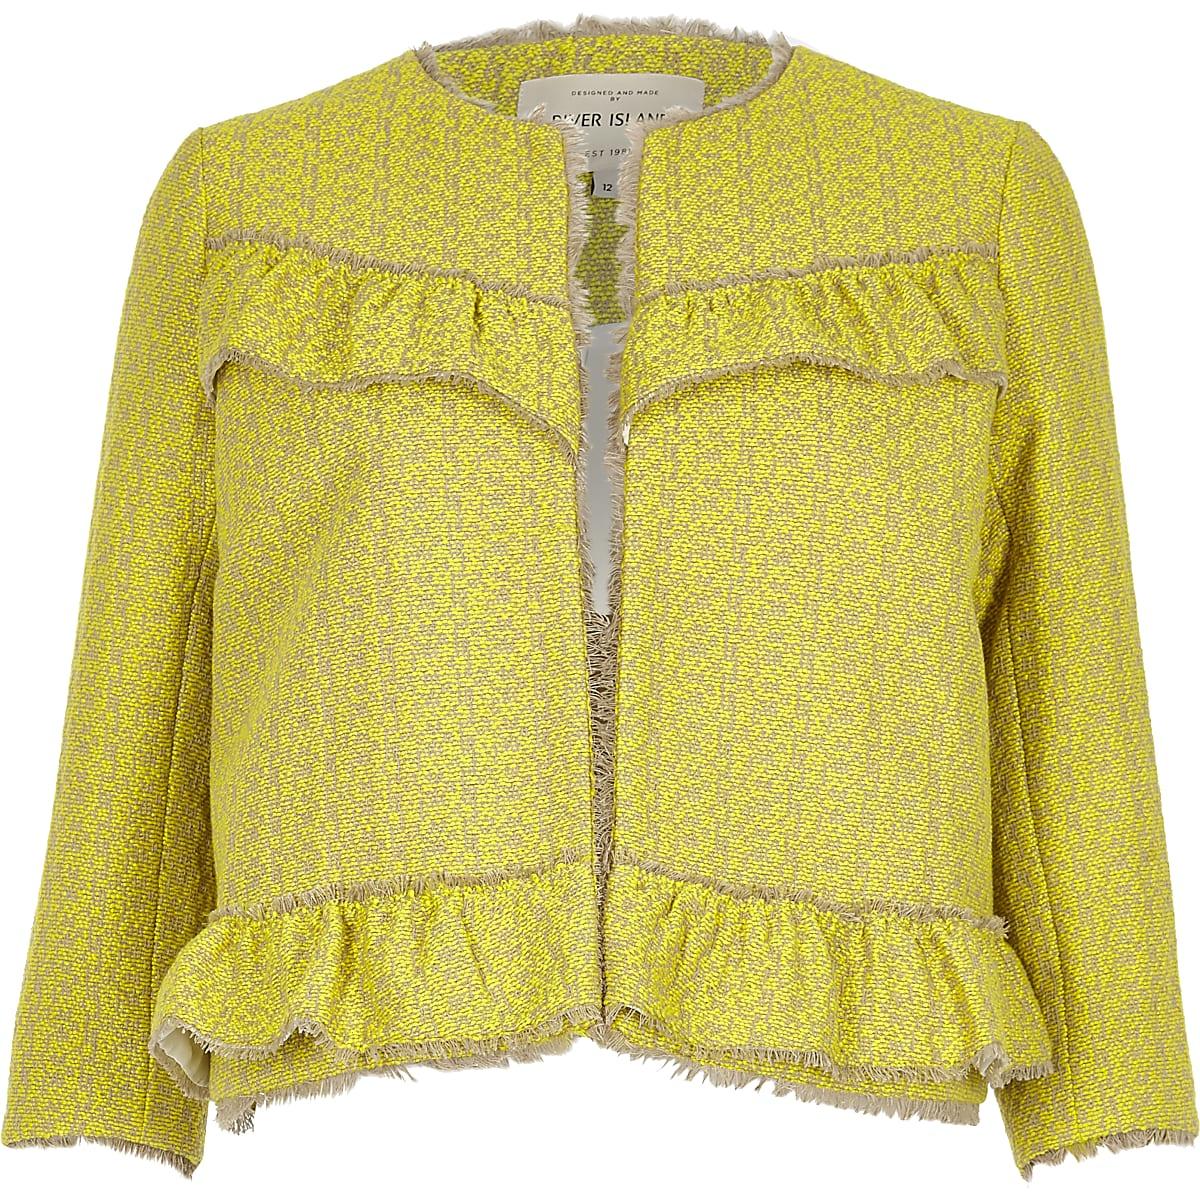 Yellow frill tweed jacket